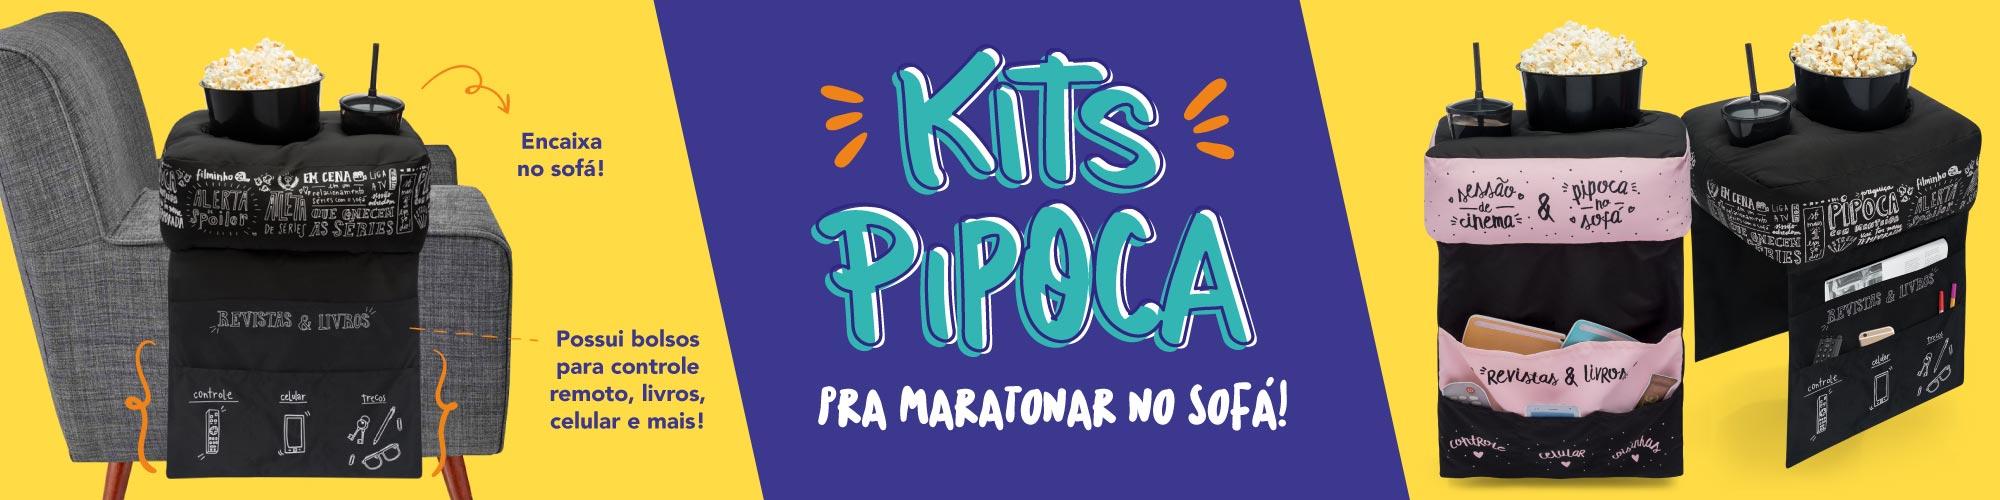 A - KIT PIPOCA